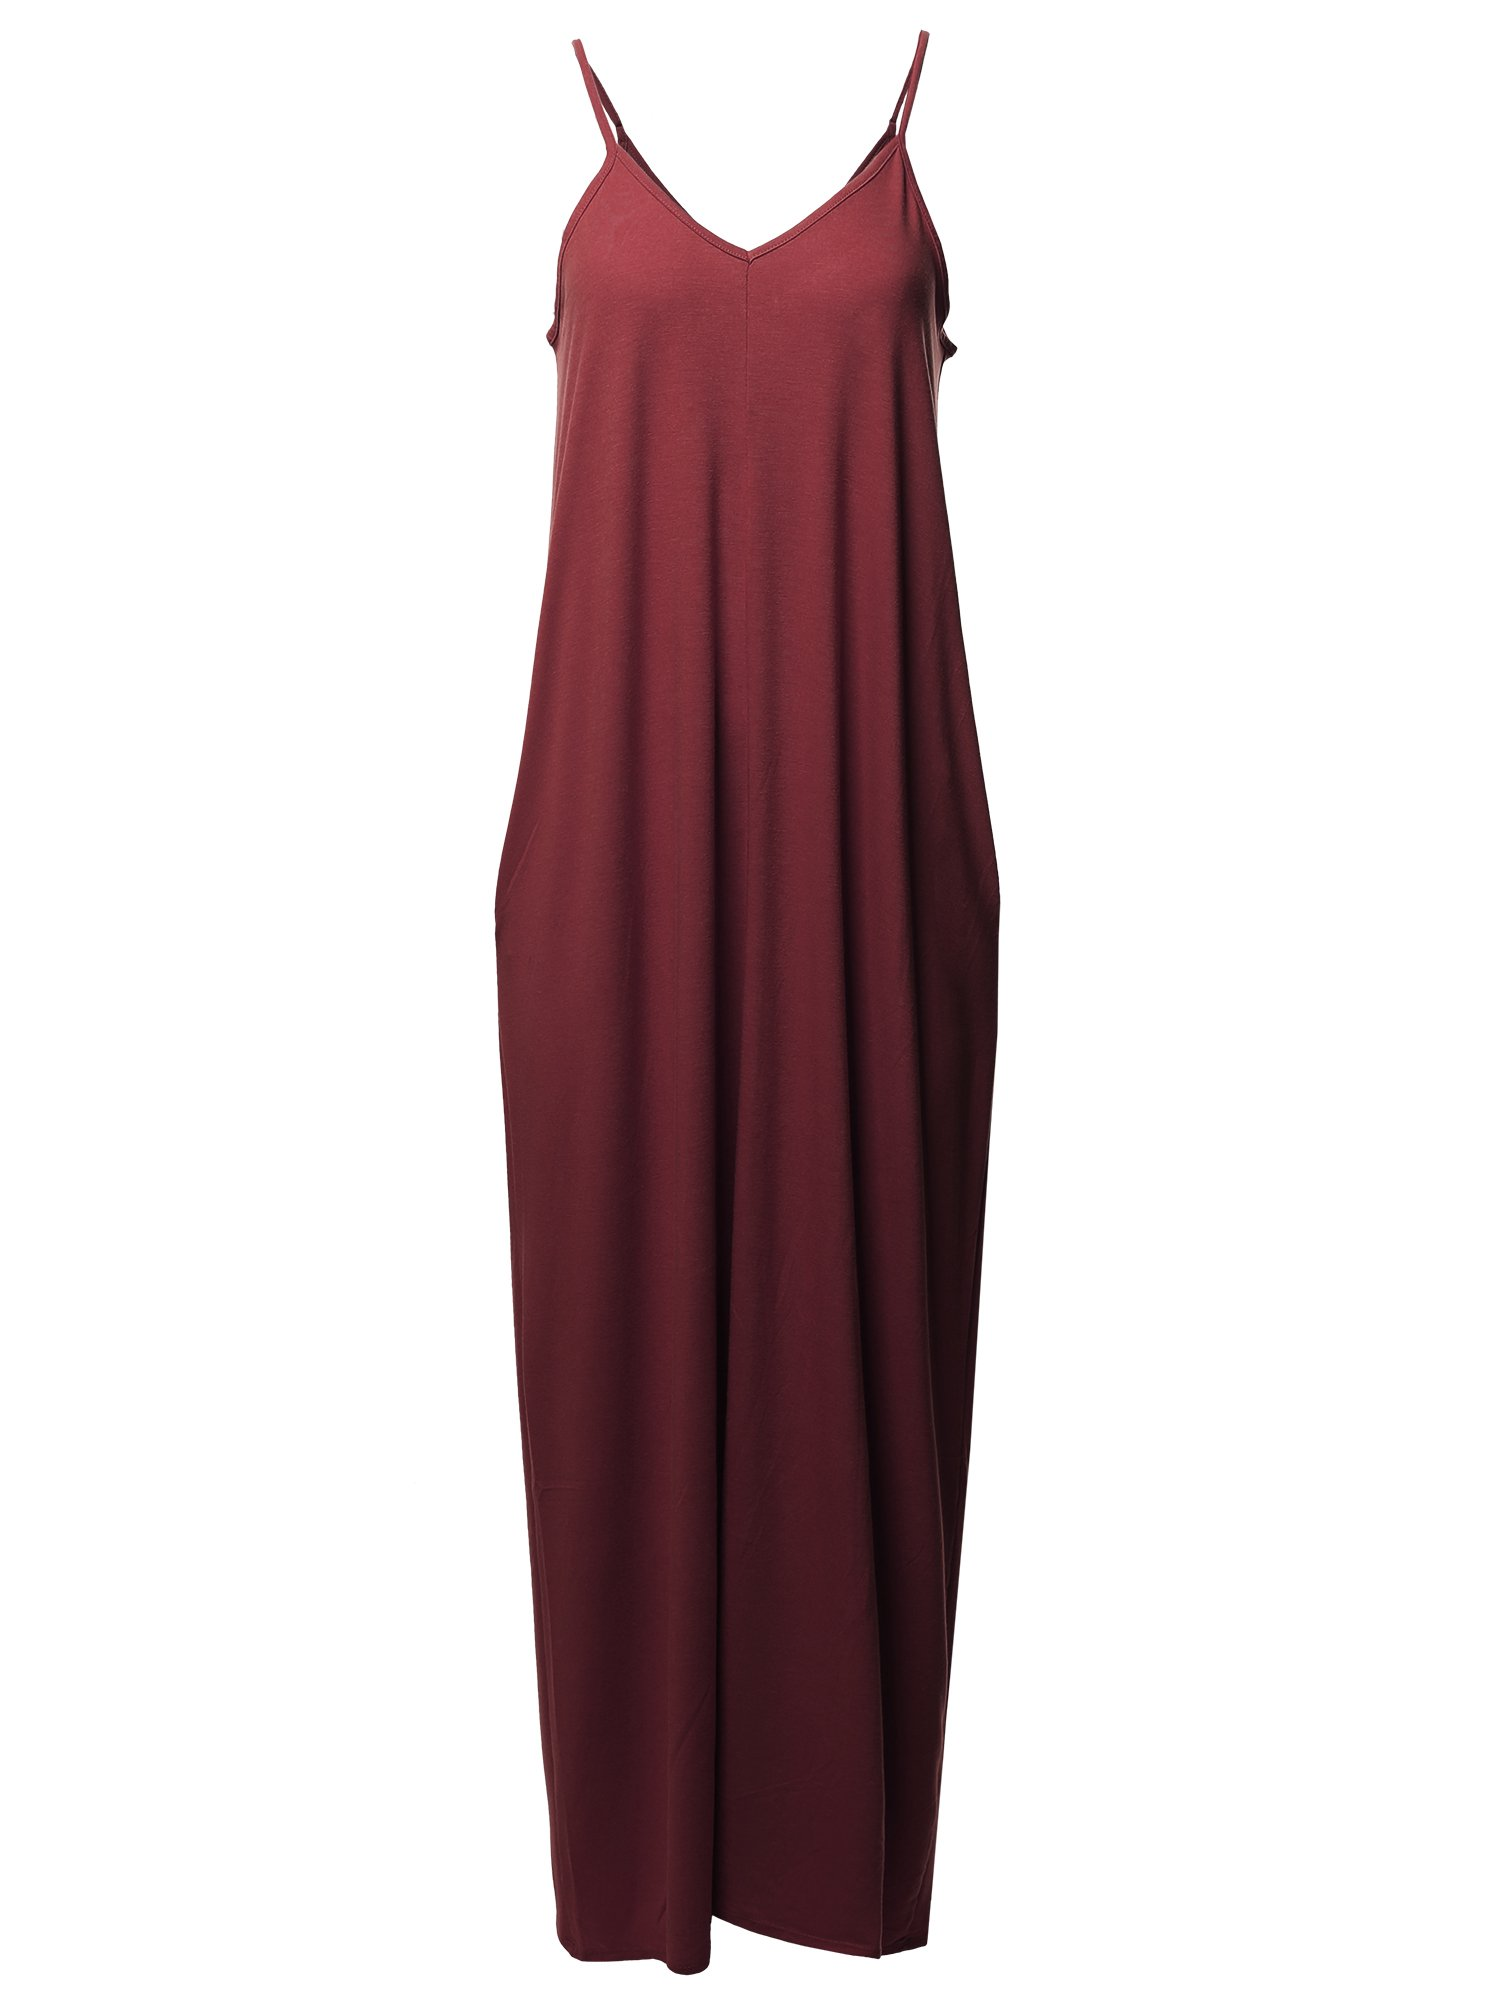 Casual Premium Adjustable Strap Side Pockets Loose Maxi Dress Dark Burgundy S